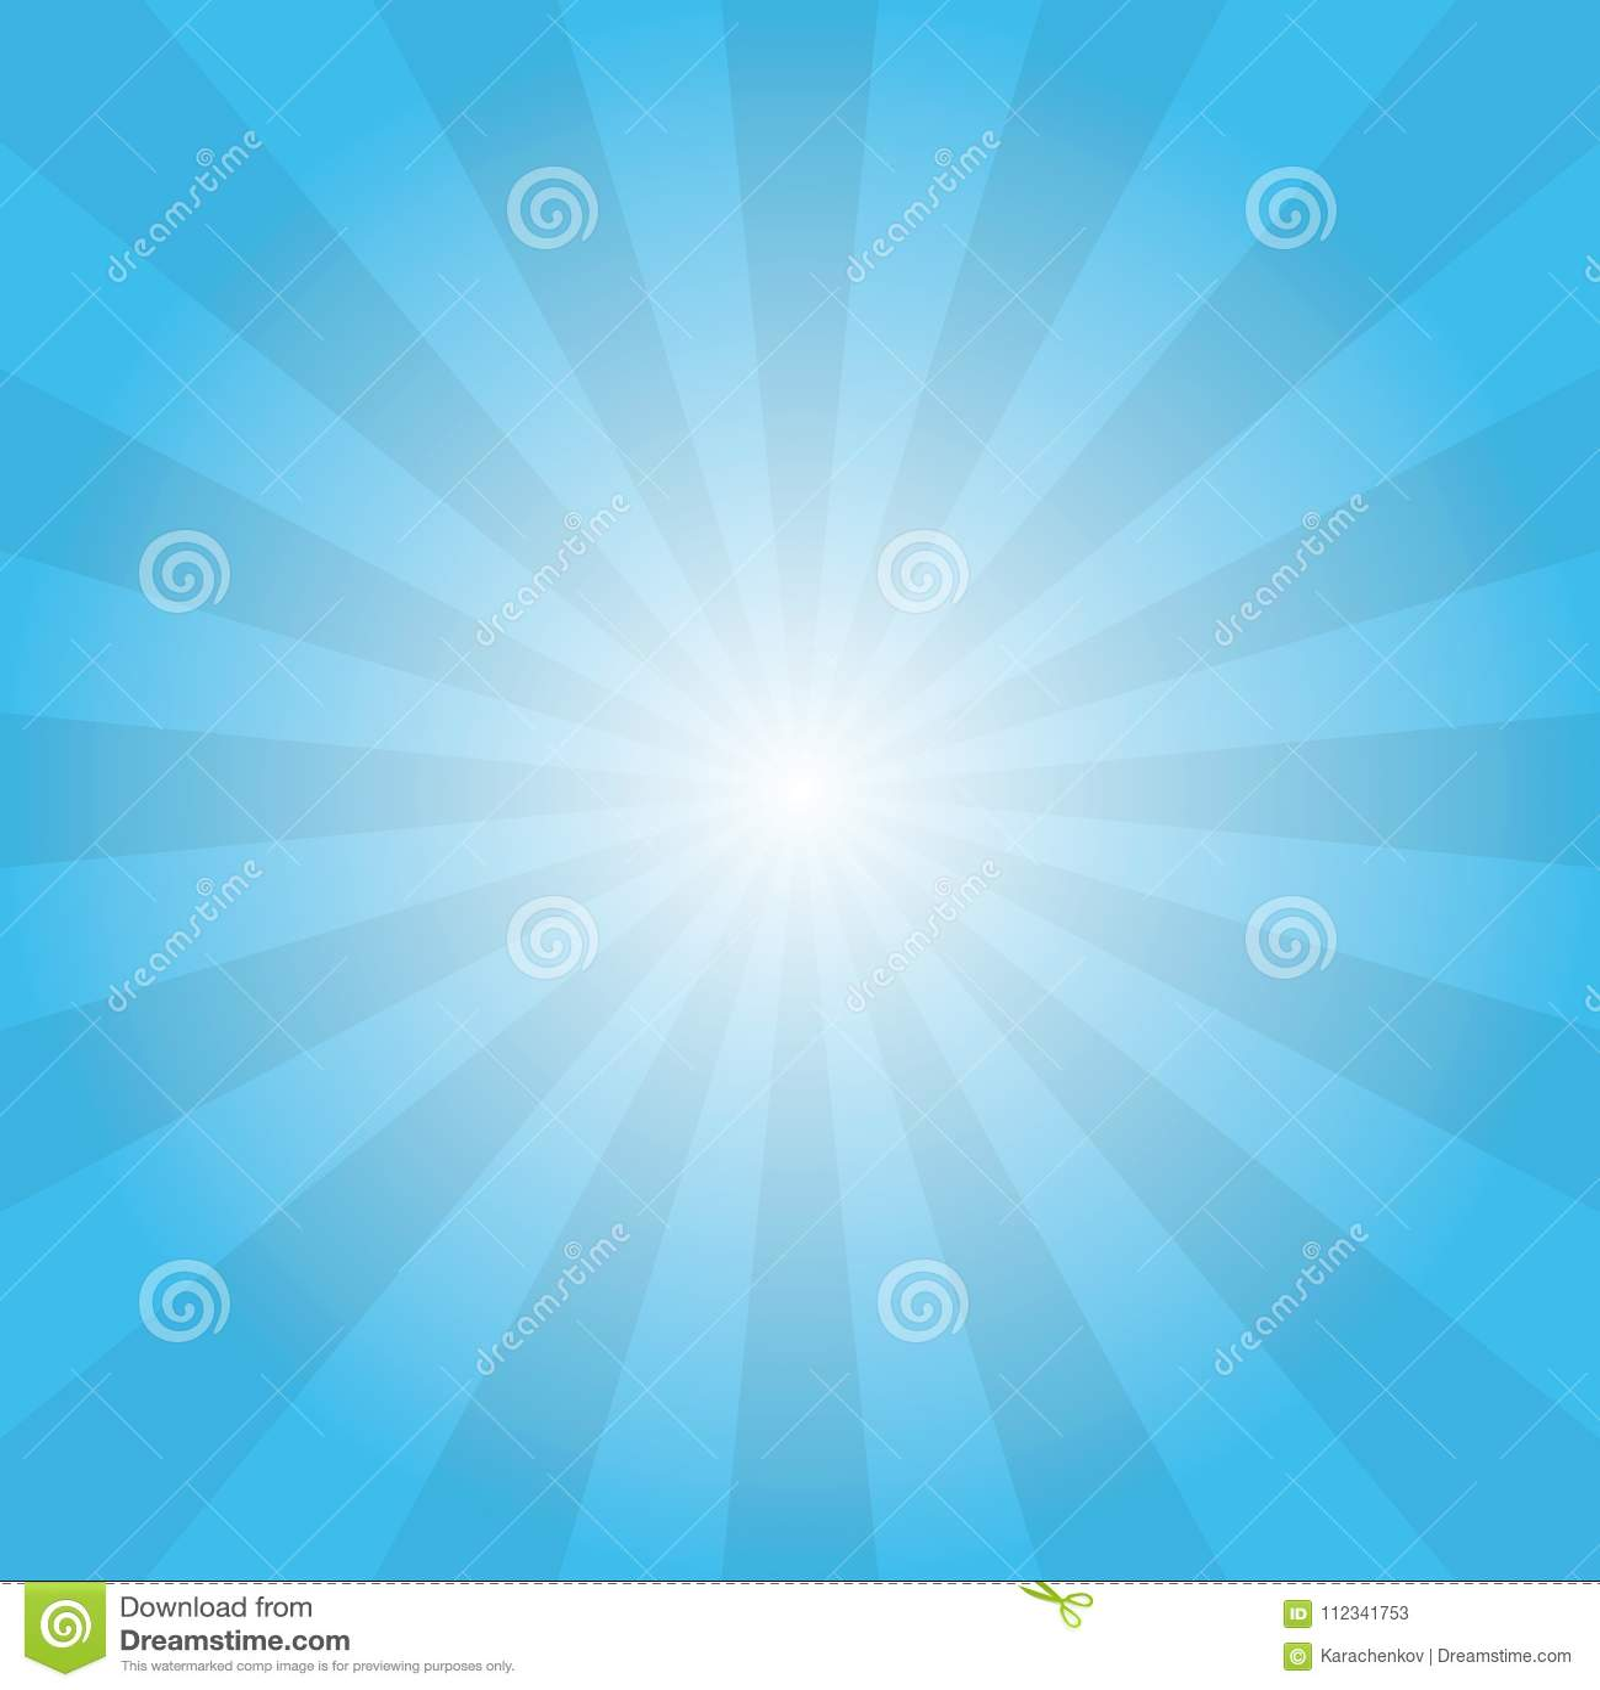 Vintage Sun Ays On Blue Sky Poster Background Stock Illustration